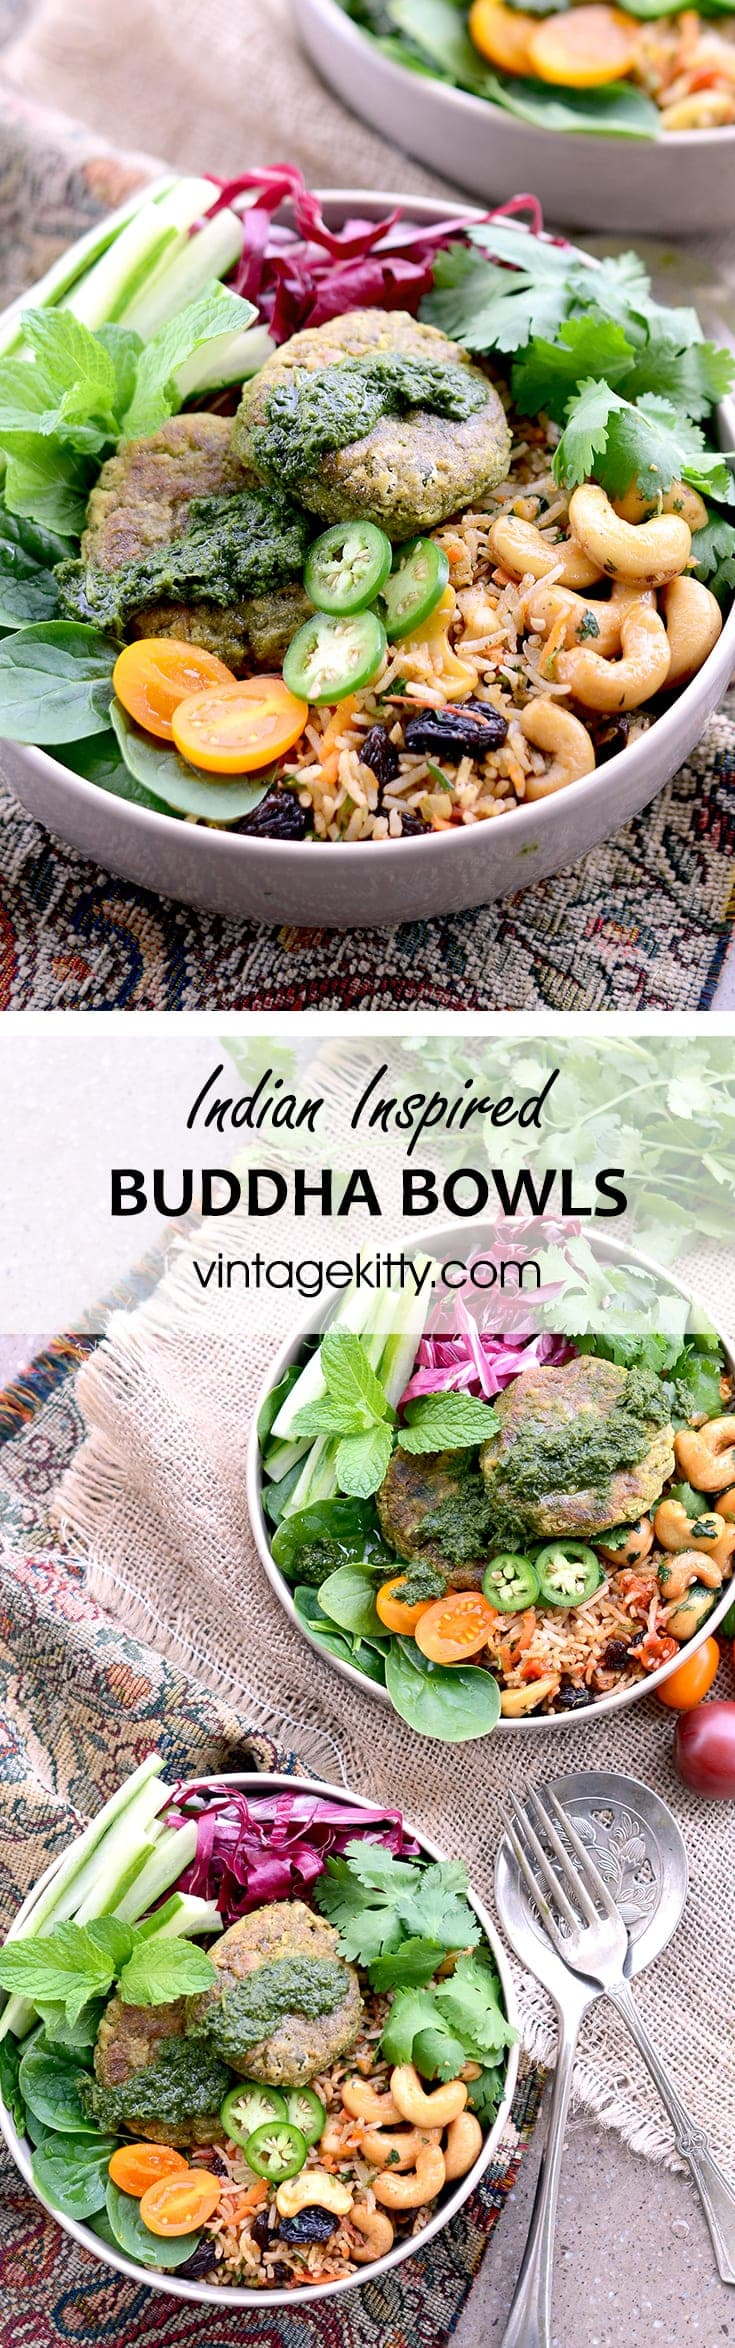 Indian Inspired Buddha Bowls - Earth Day #diydatenight